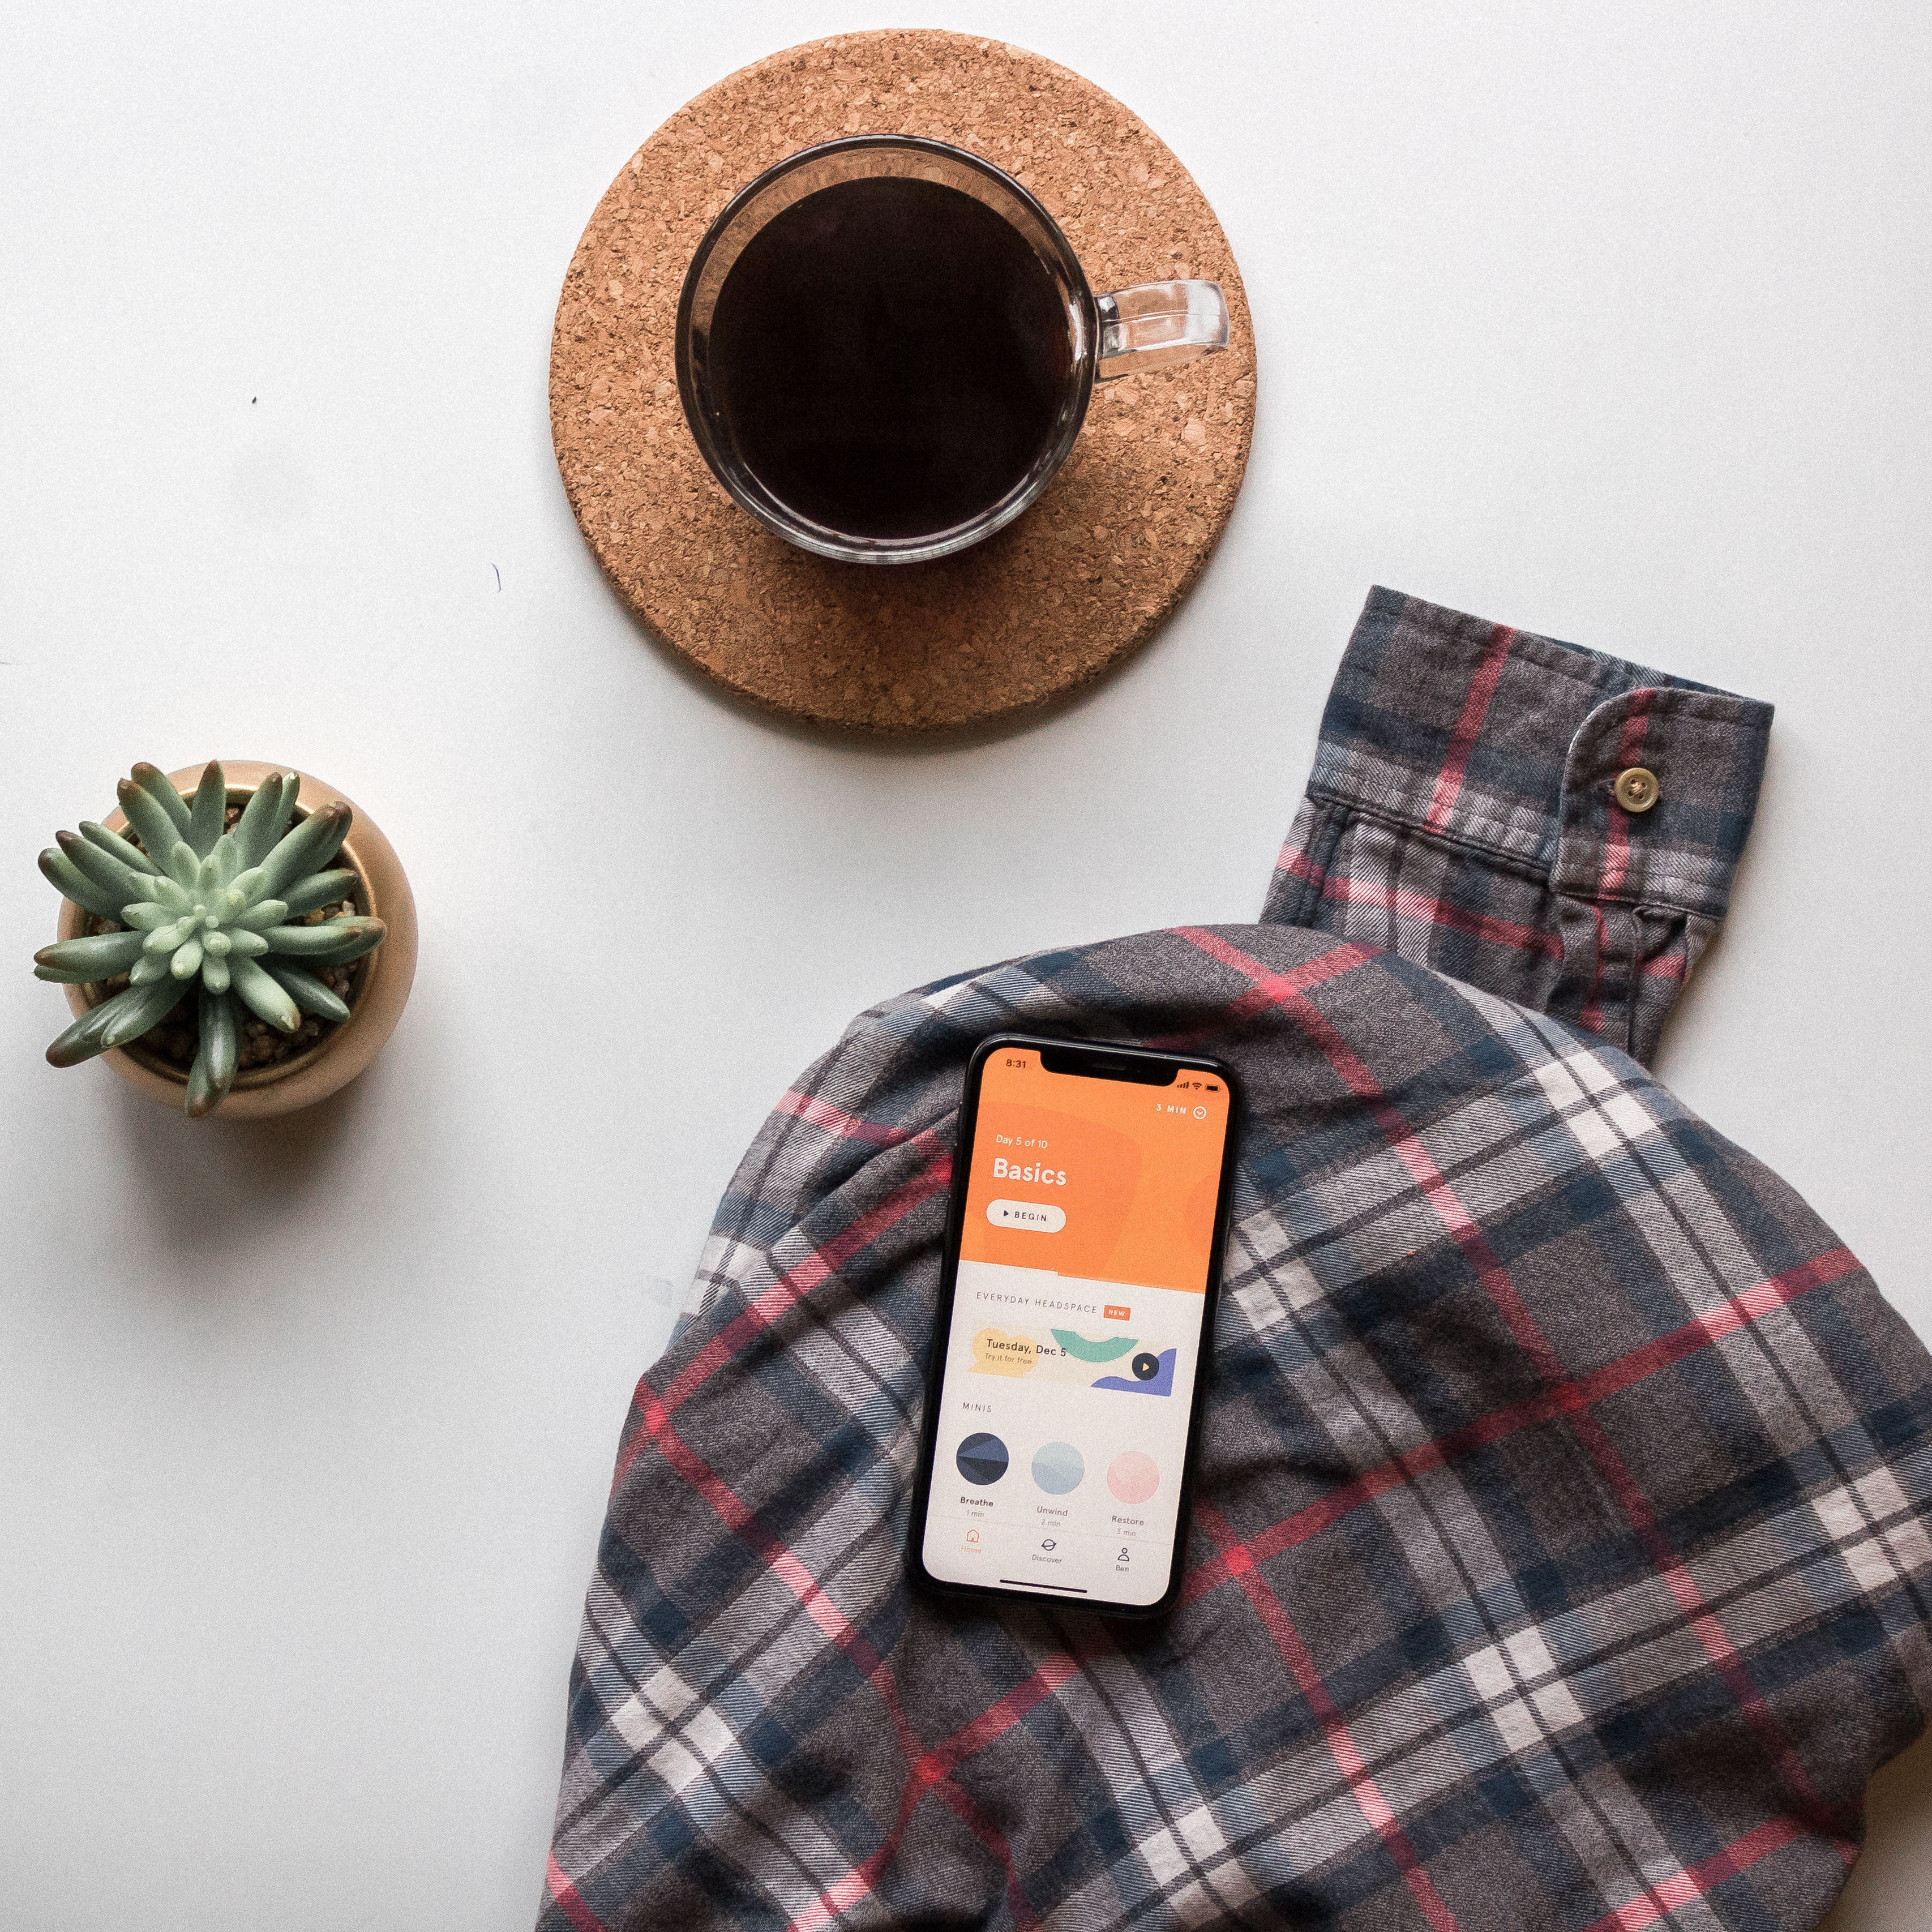 black smartphone on long-sleeved shirt